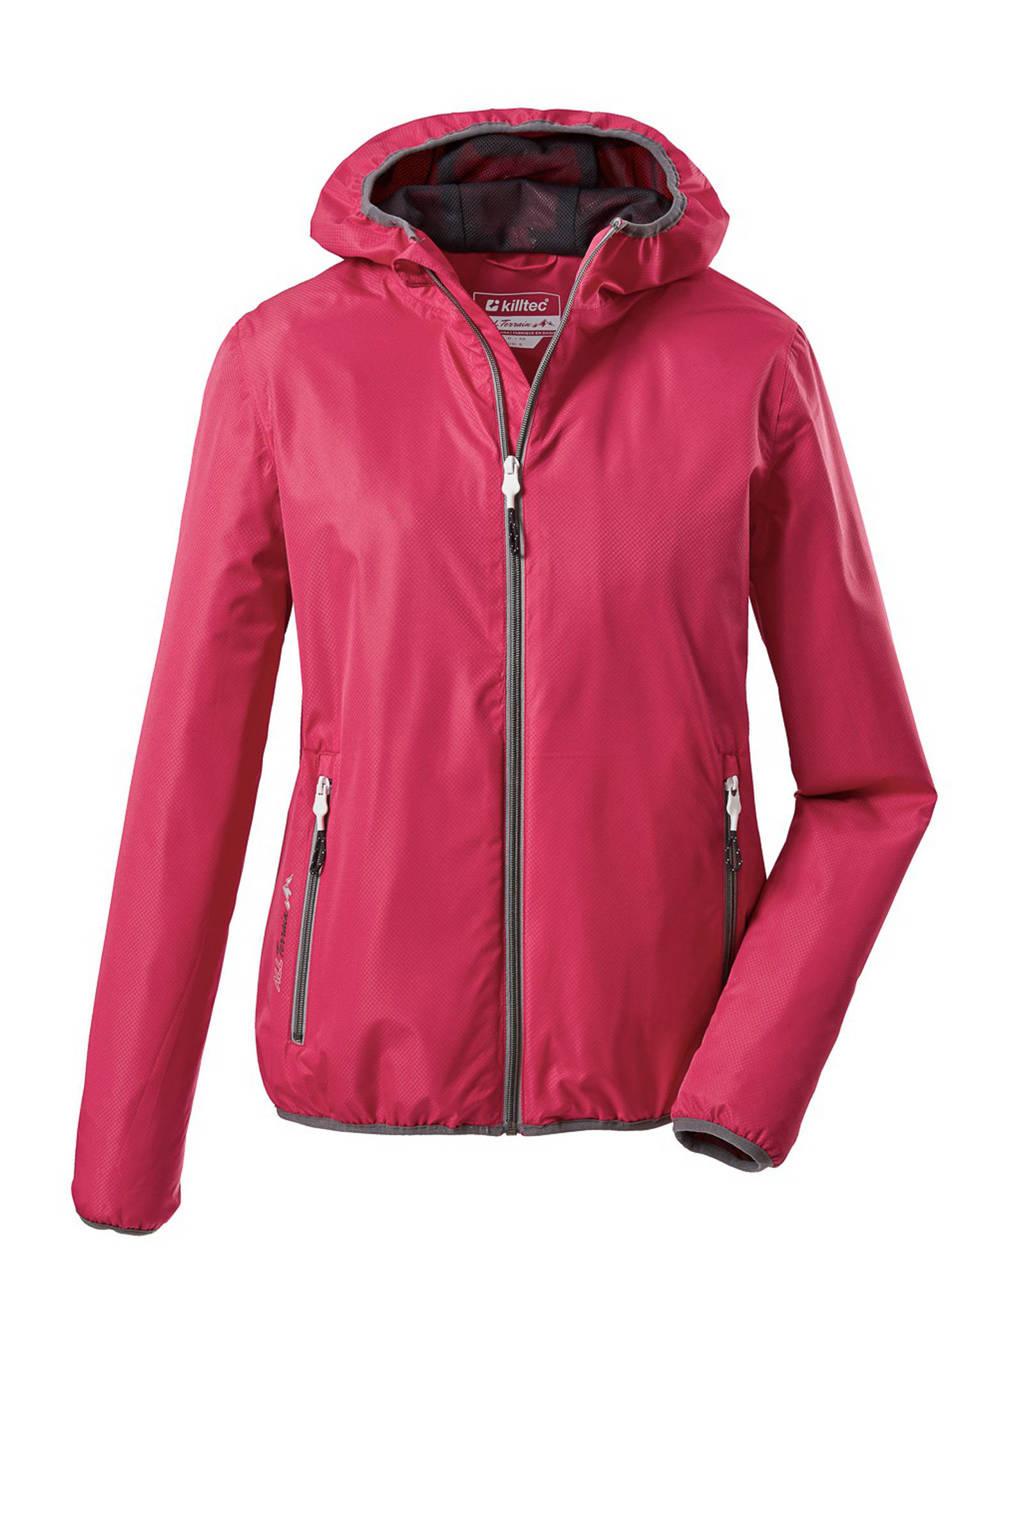 Killtec outdoor jas Trin rood, Rood